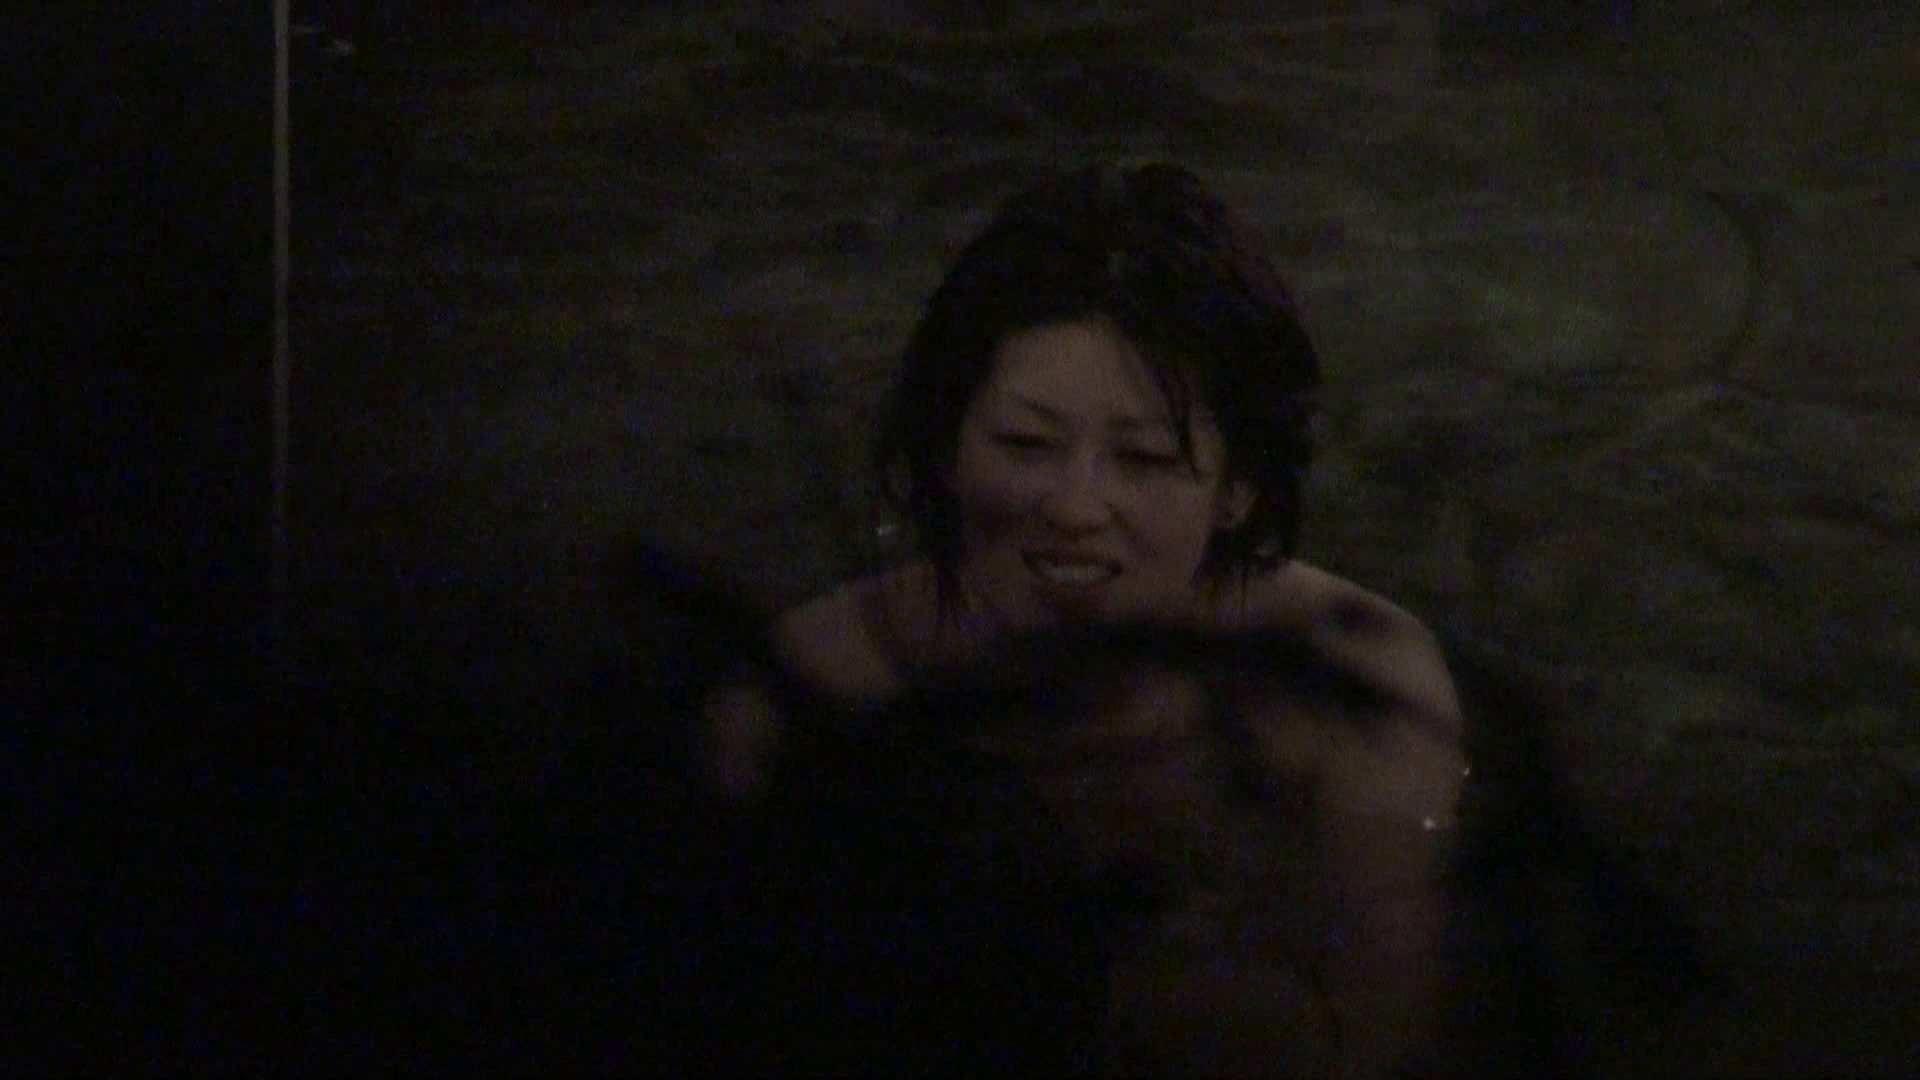 Aquaな露天風呂Vol.376 0  33連発 10